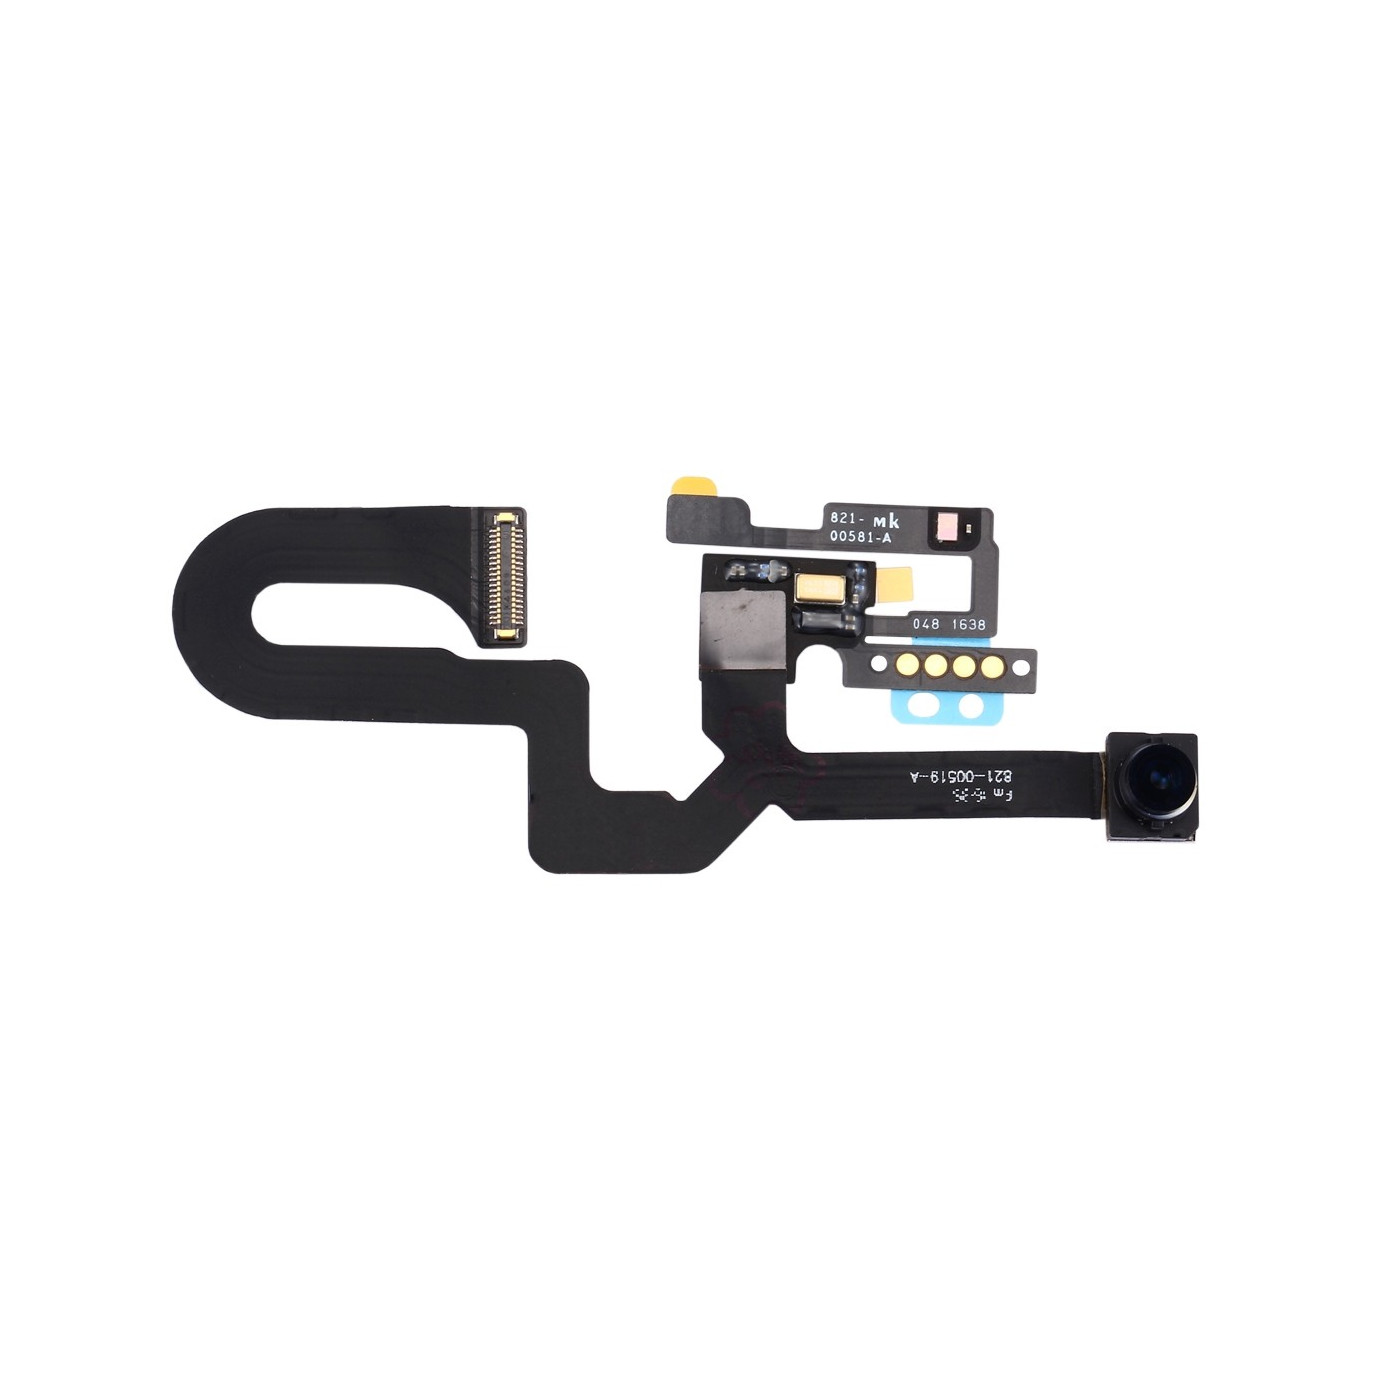 Front camera for Apple iPhone 7 plus brightness sensor flat microphone